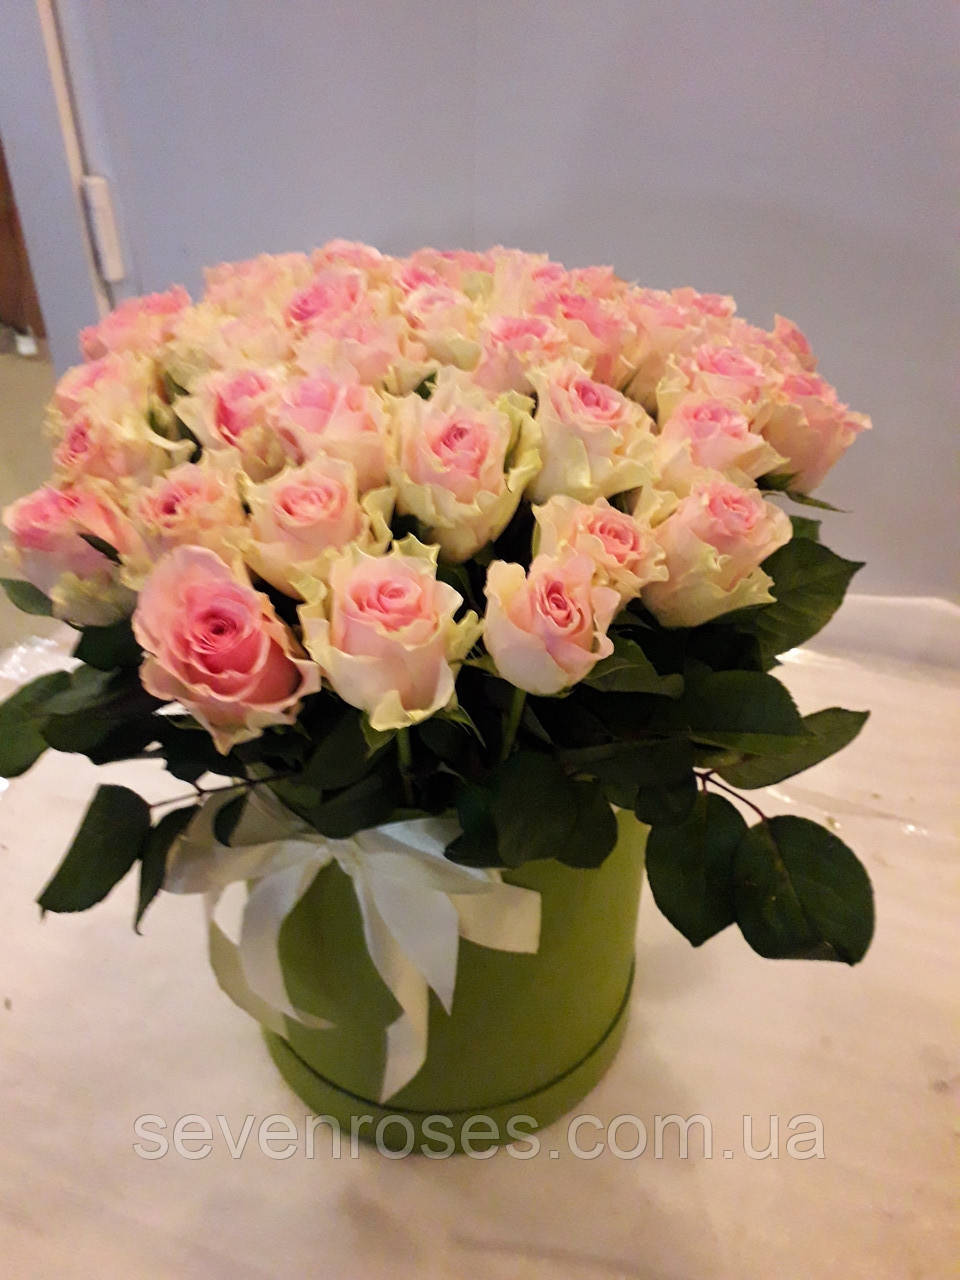 Коробка из 31 розы